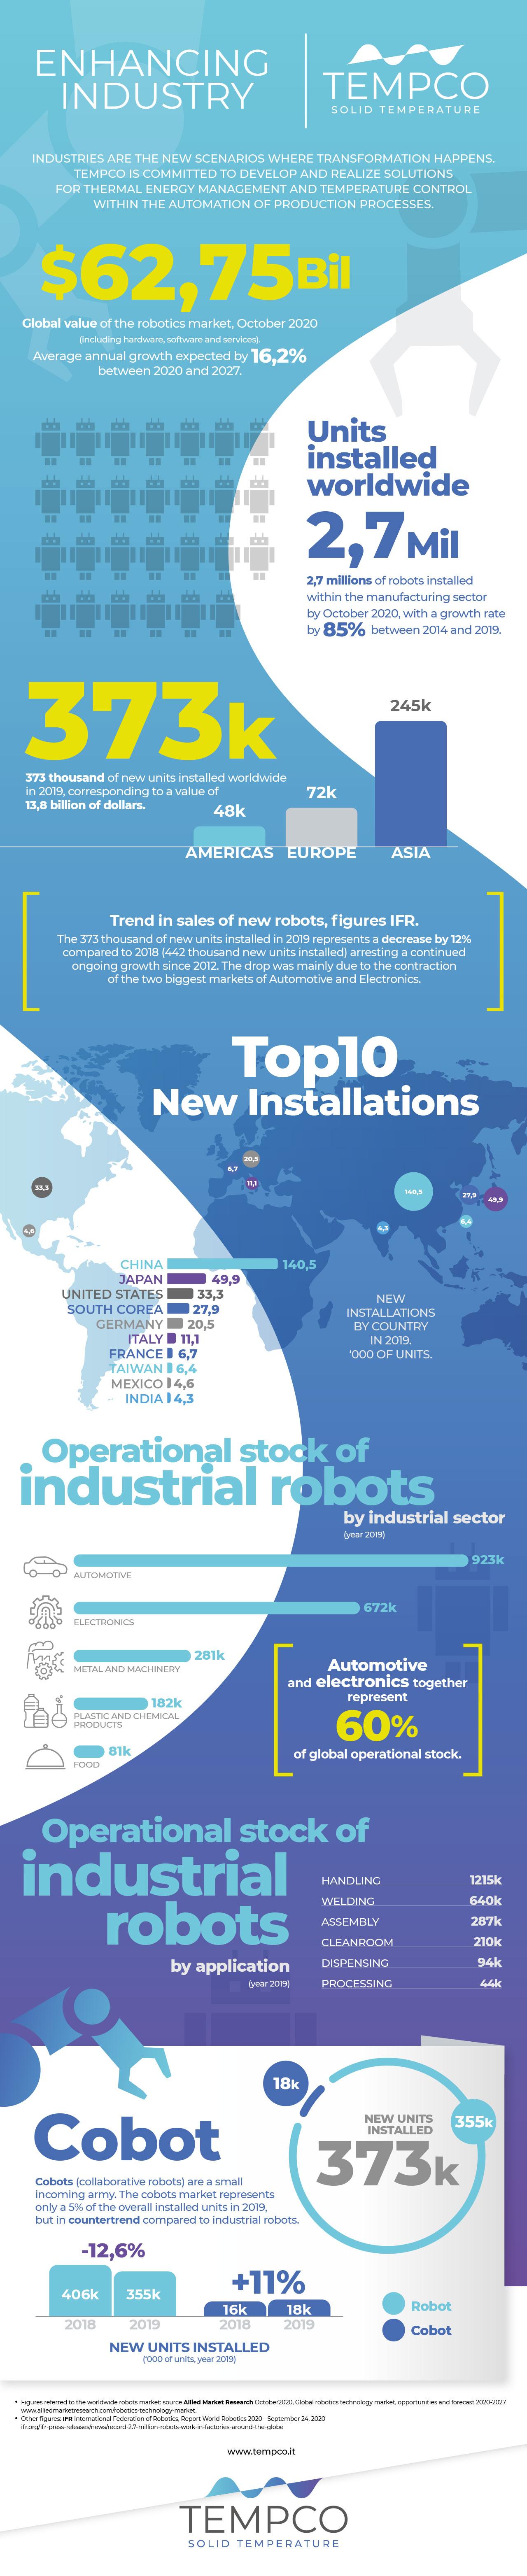 Info_enhancing-industry